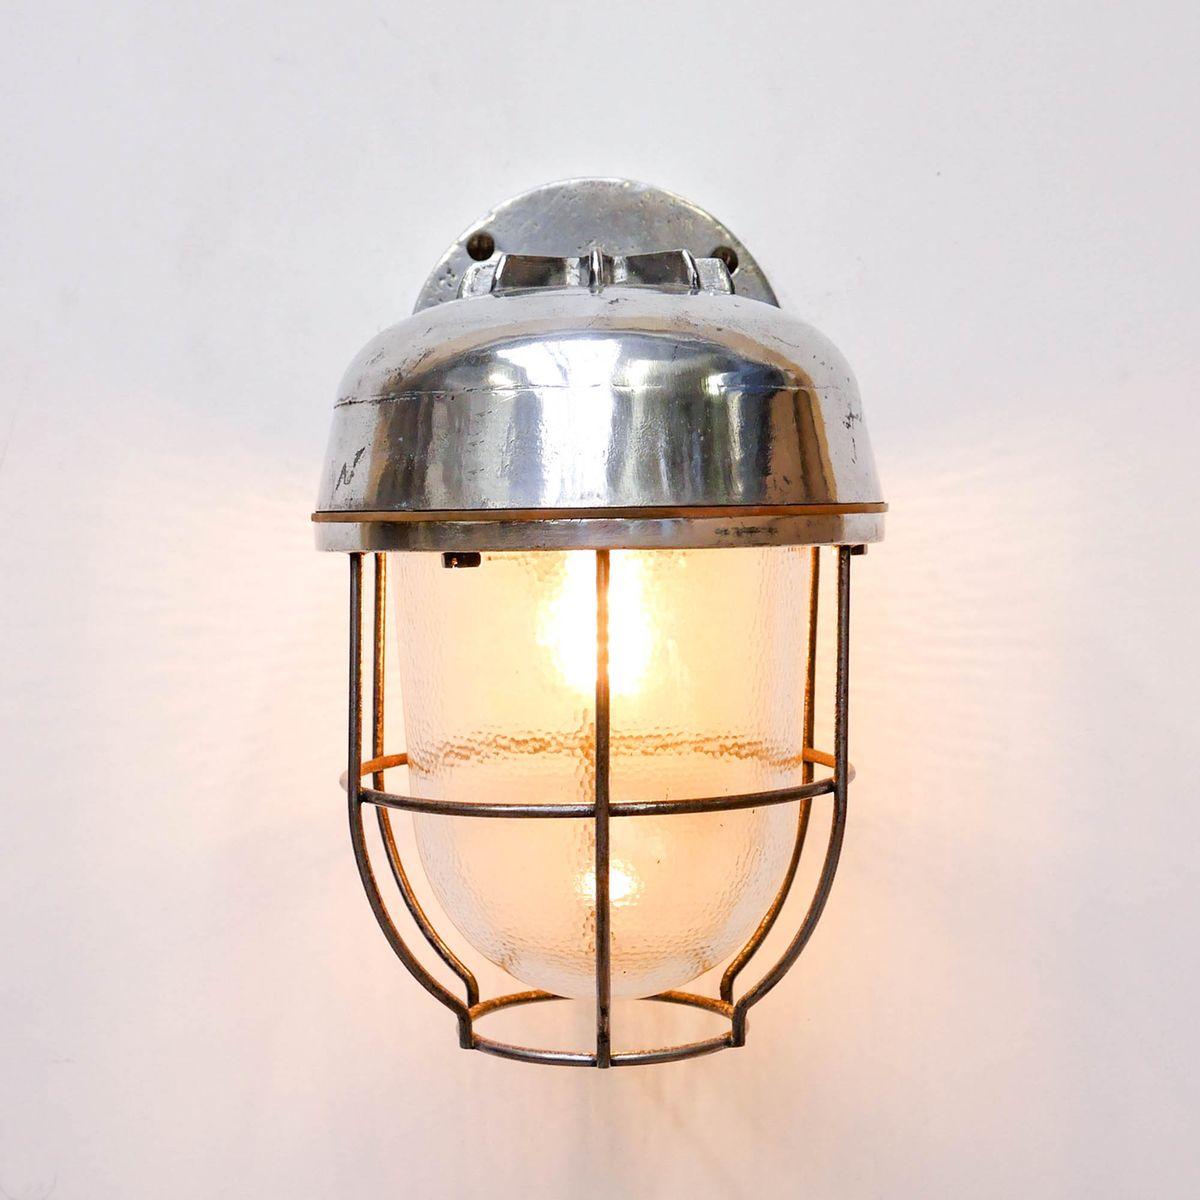 Vintage Lantern Wall Lamp for sale at Pamono